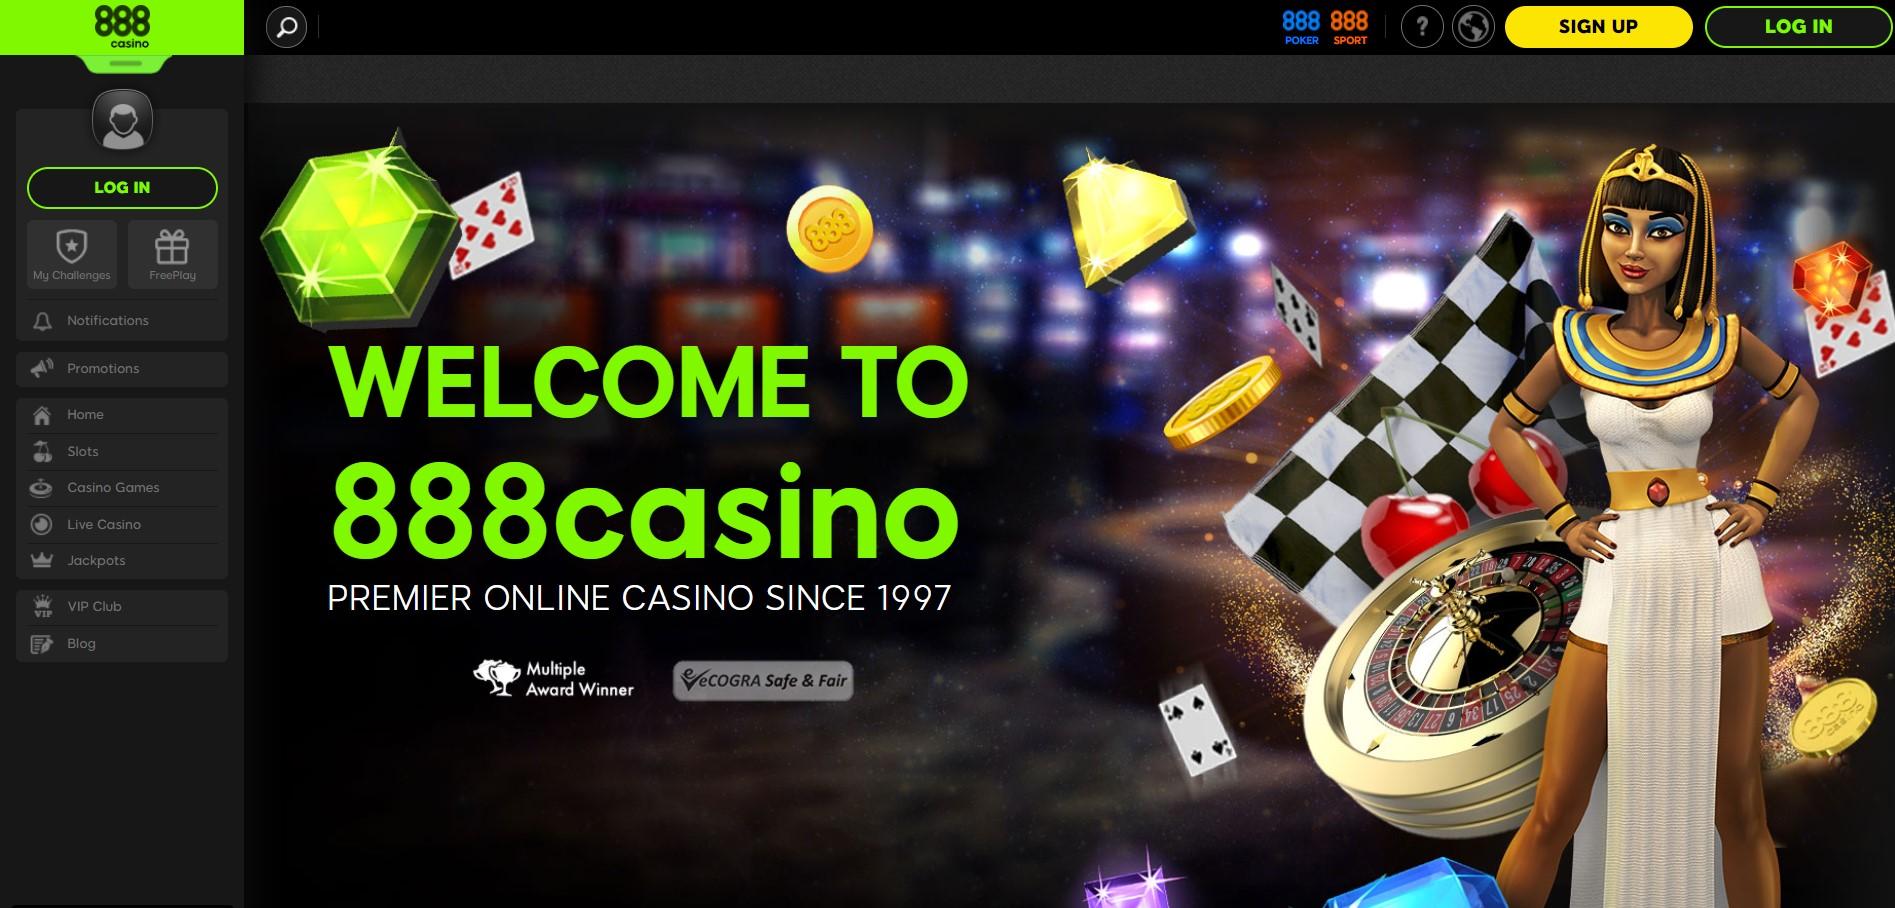 Casino 888 Login desktop